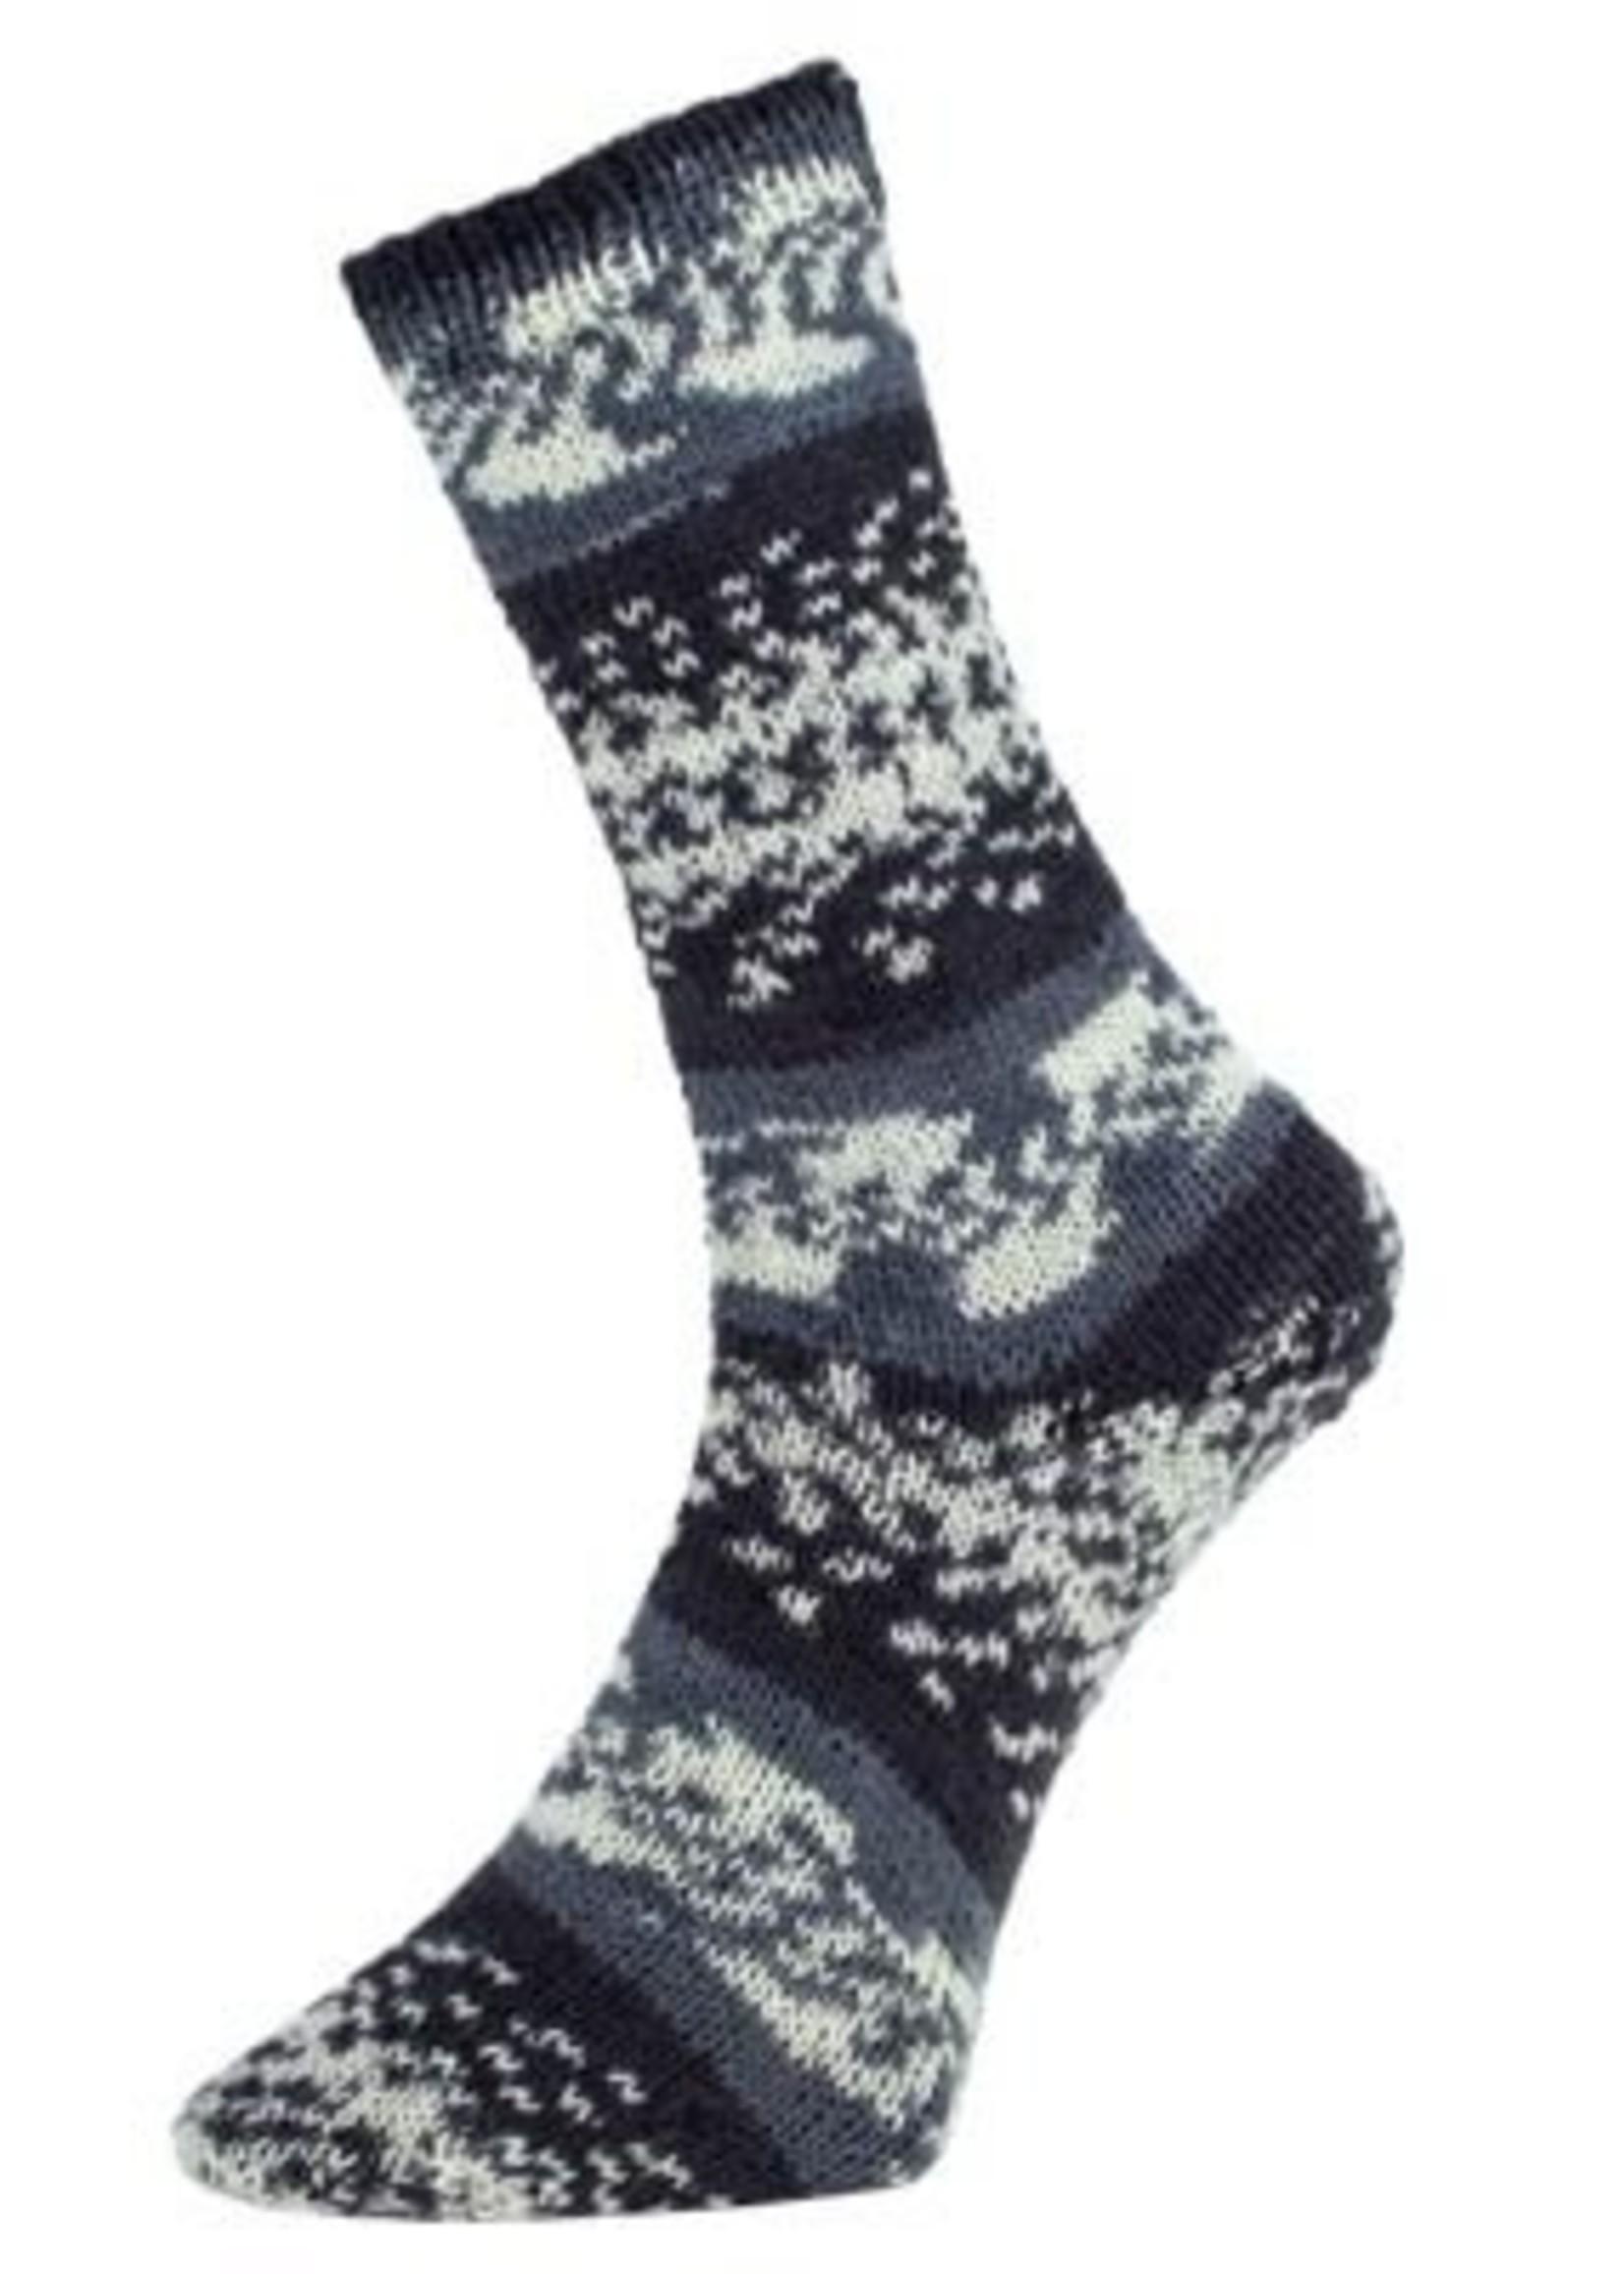 Pro Lana Pro Lana Sock Yarn Golden Fjord 4 Ply - #190 Grey